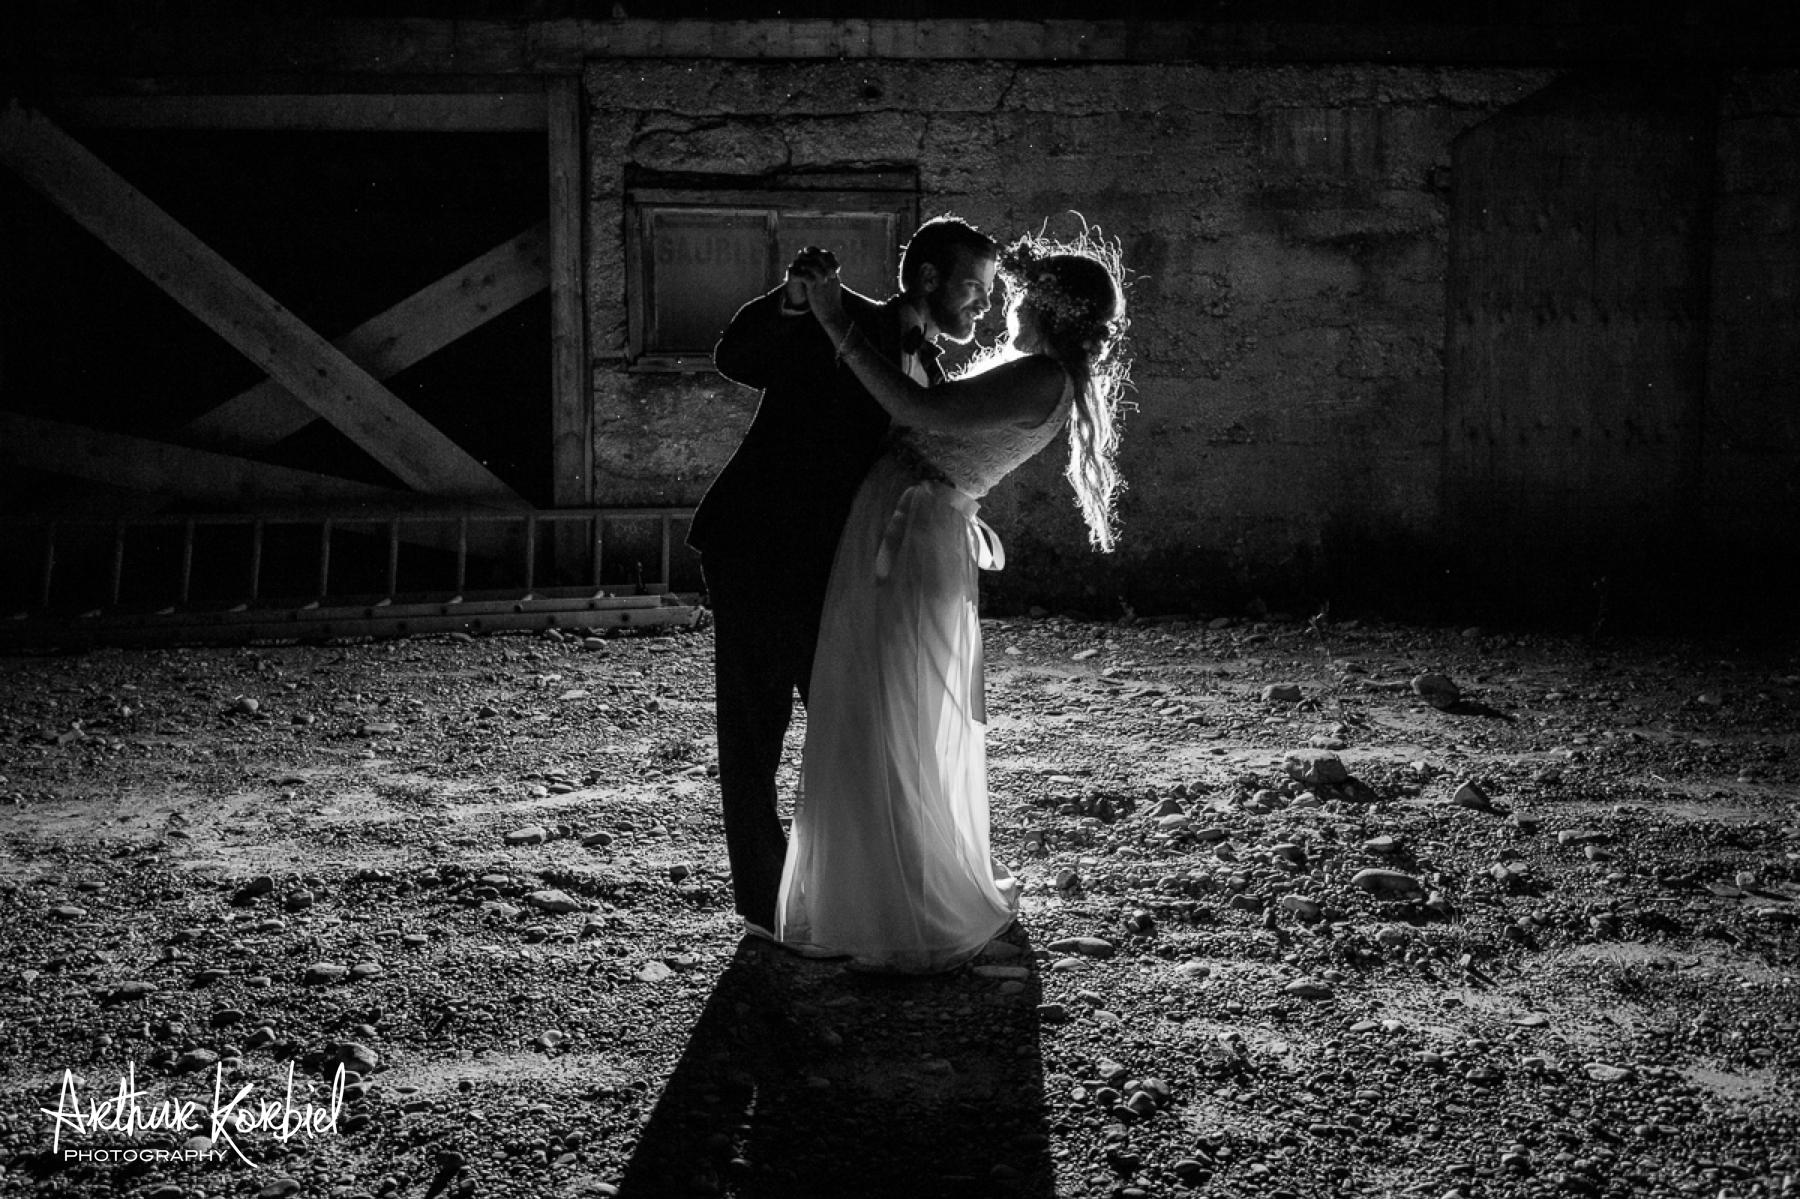 Arthur Korbiel Photography - London Engagement Photographer - Sauble Beach Barn Wedding - Samantha & Dan_015.jpg